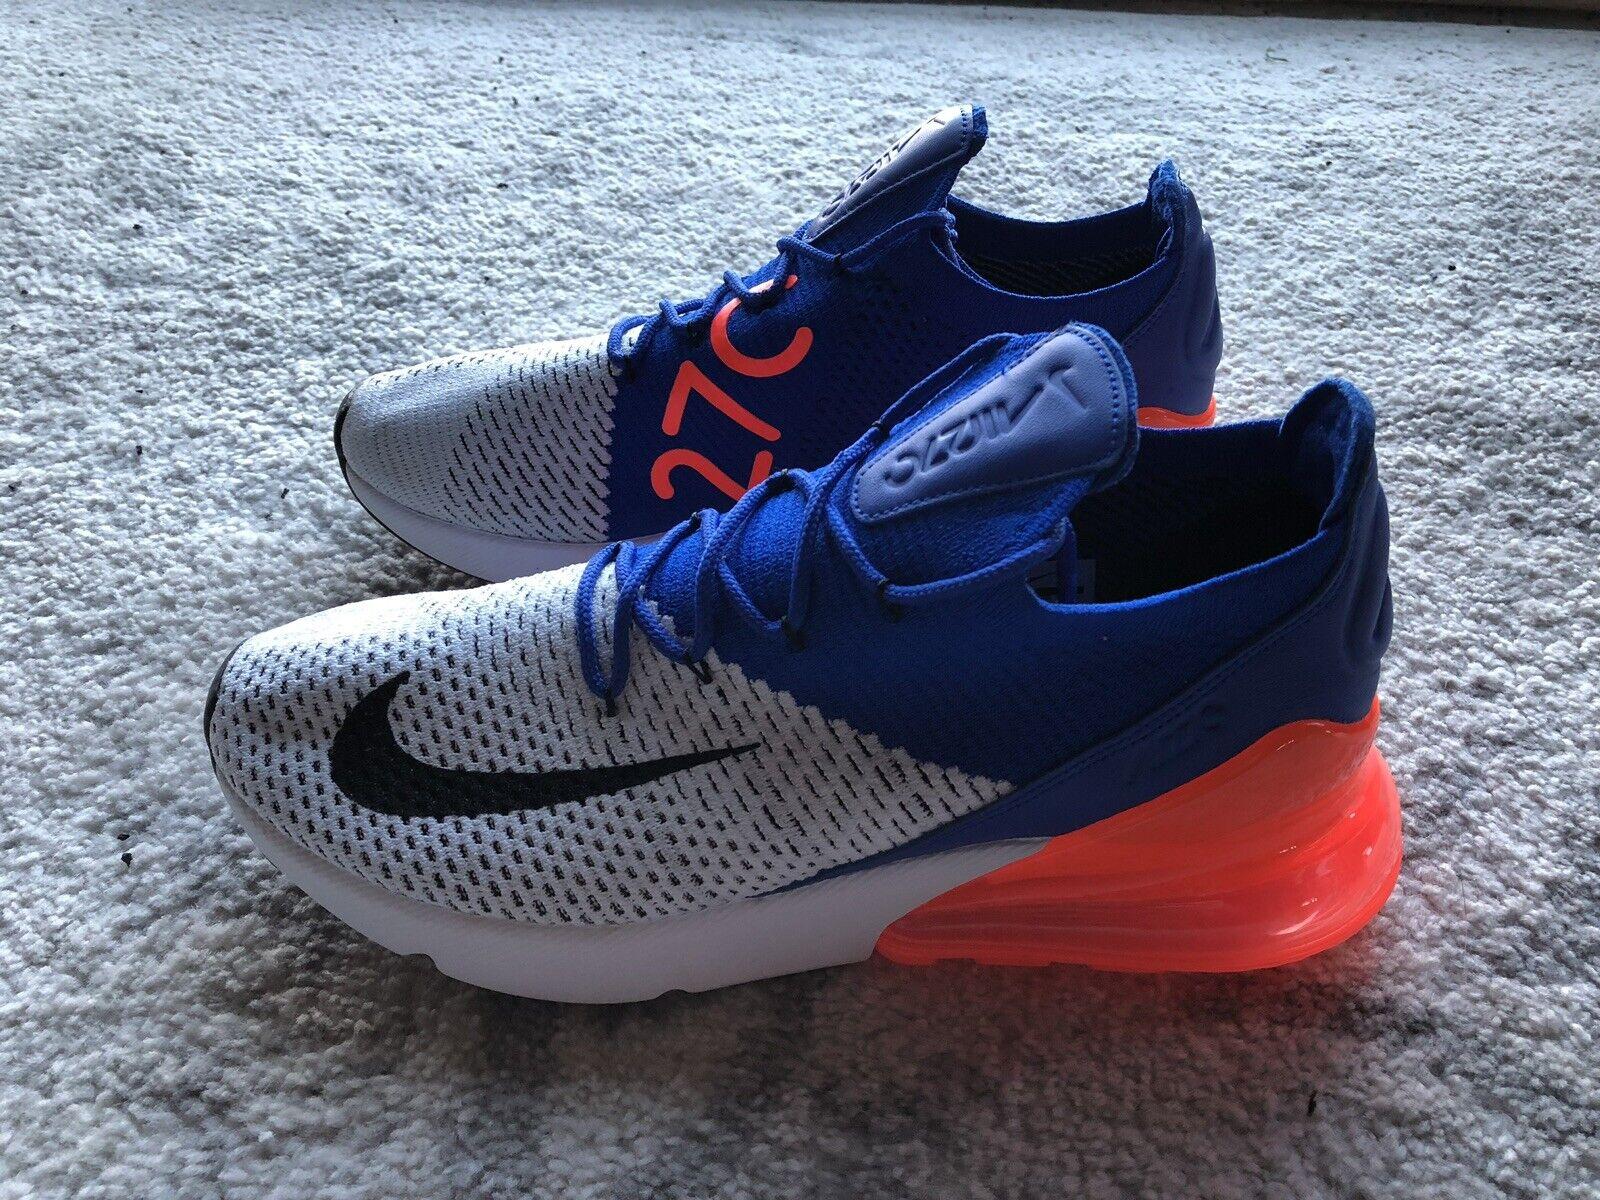 Nike Men's Air Max Max Max 270 Flyknit shoes AO1023-101 White bluee orange Size 10.5 31c9cf